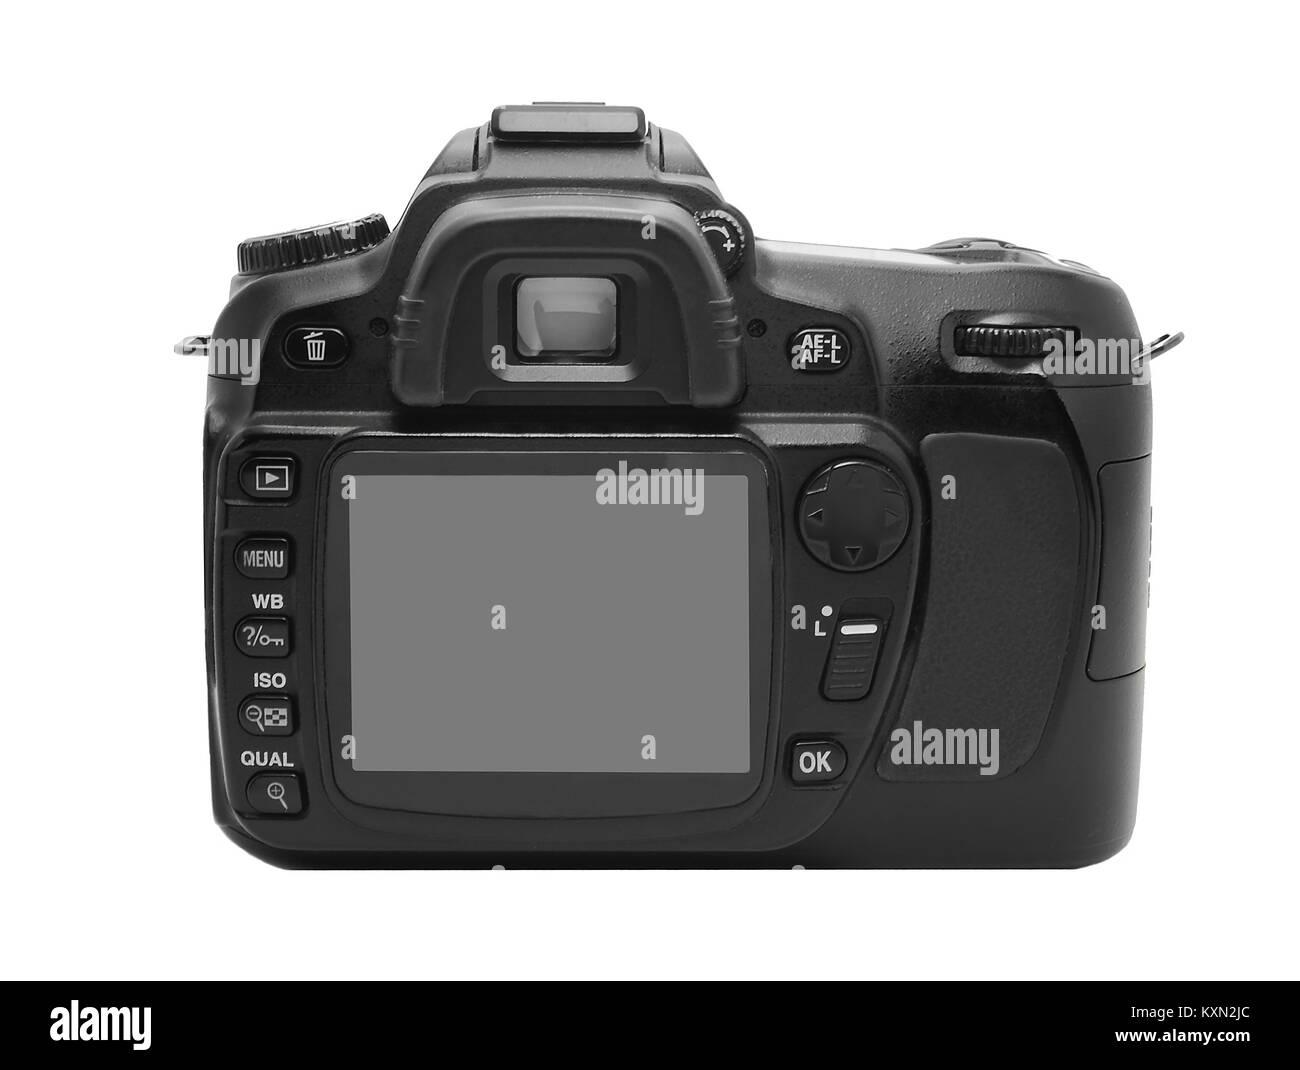 Dslr photo camera display - Stock Image